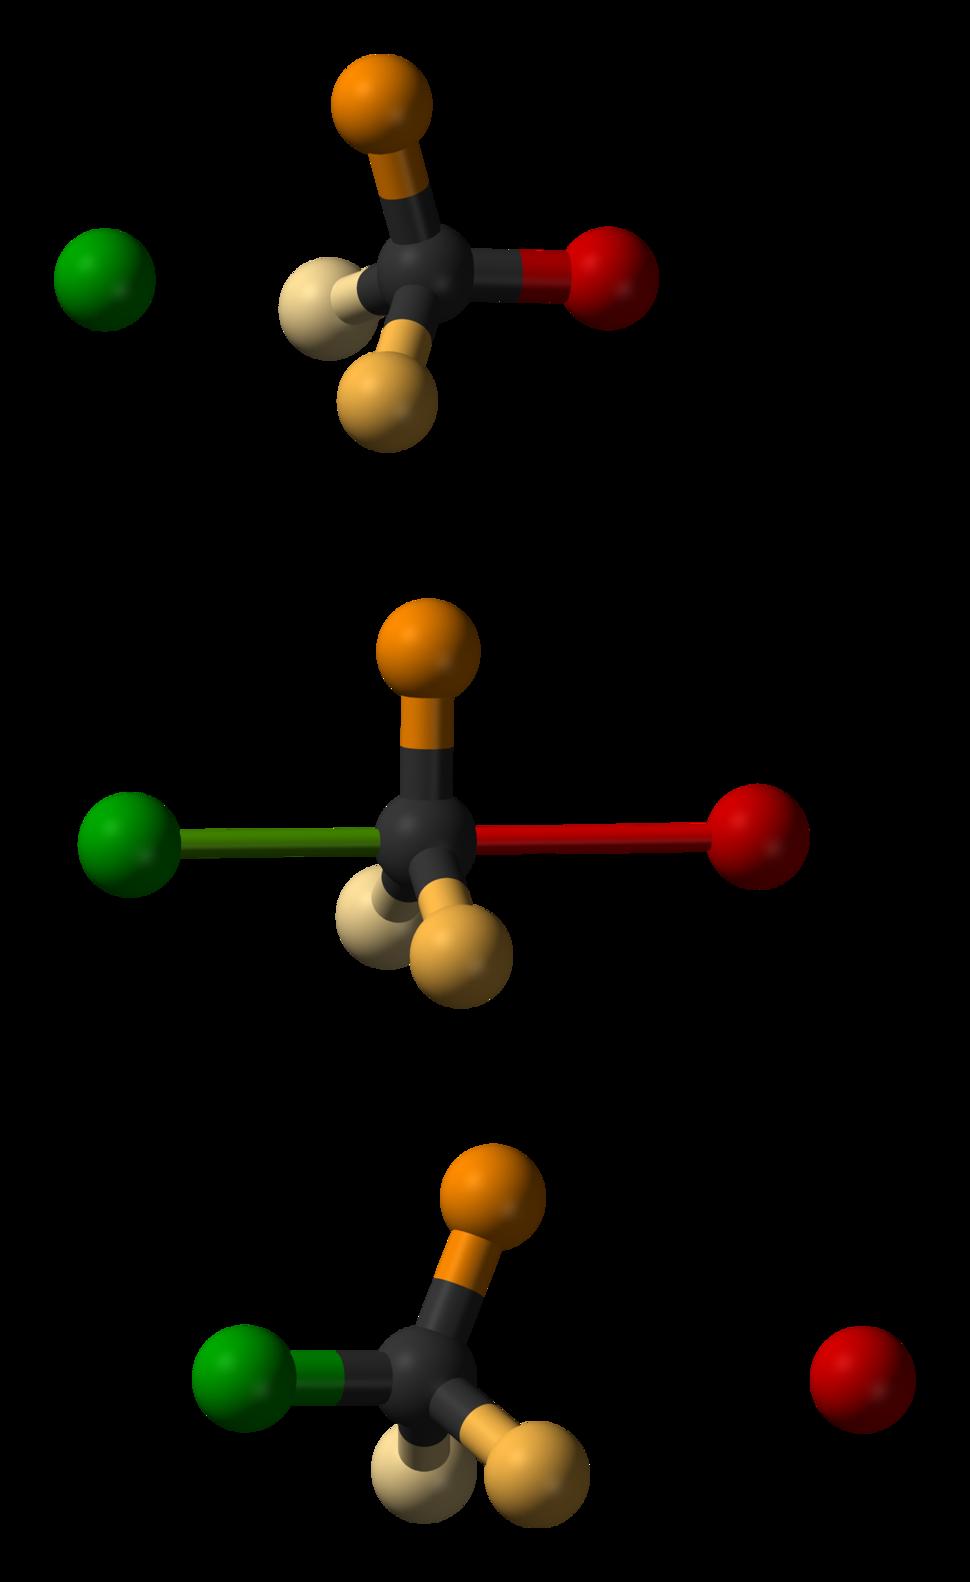 Walden-inversion-3D-balls